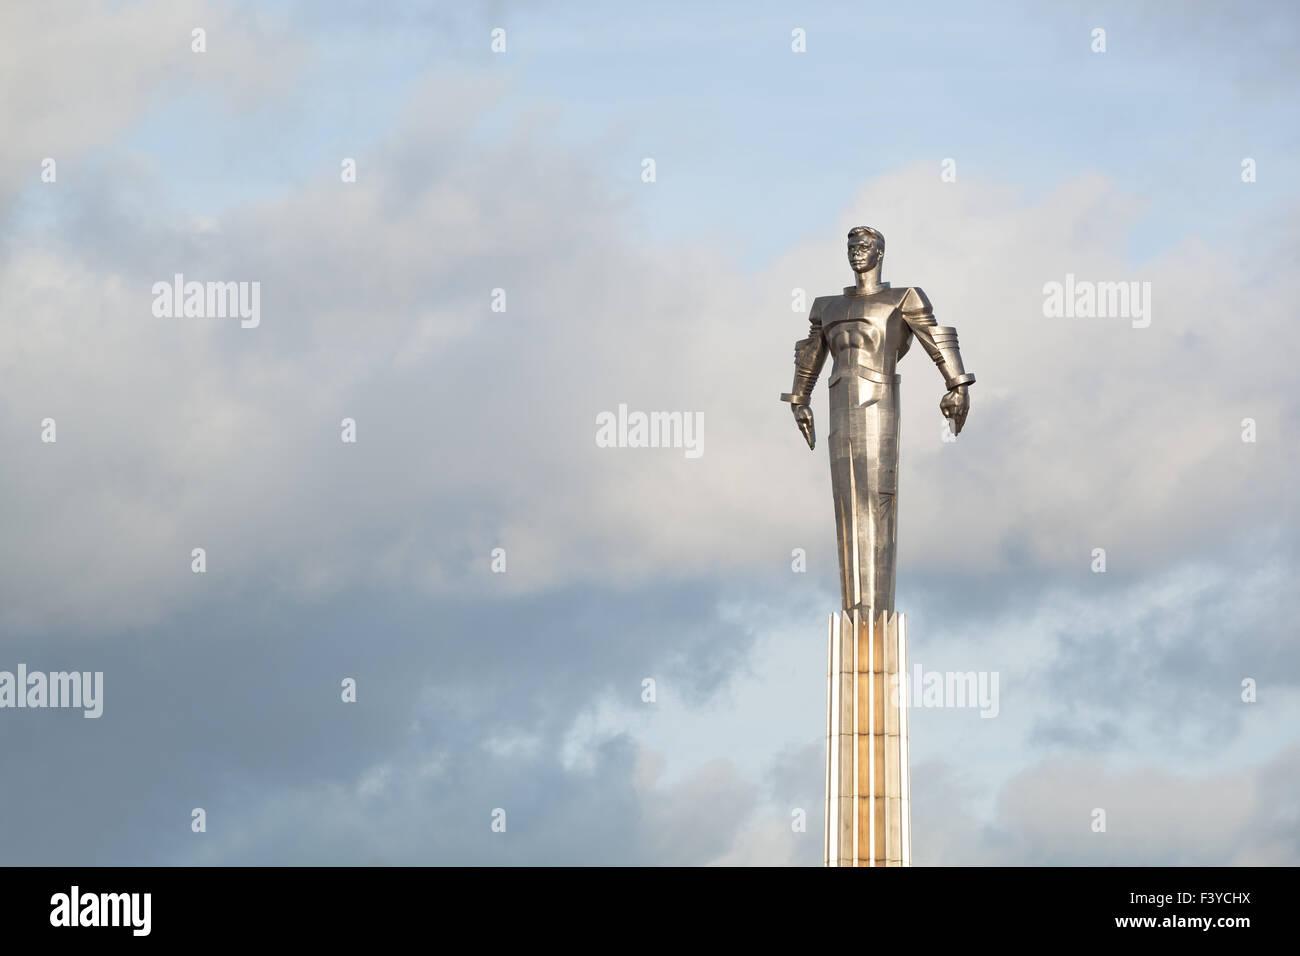 Yuri Gagarin monument - Stock Image